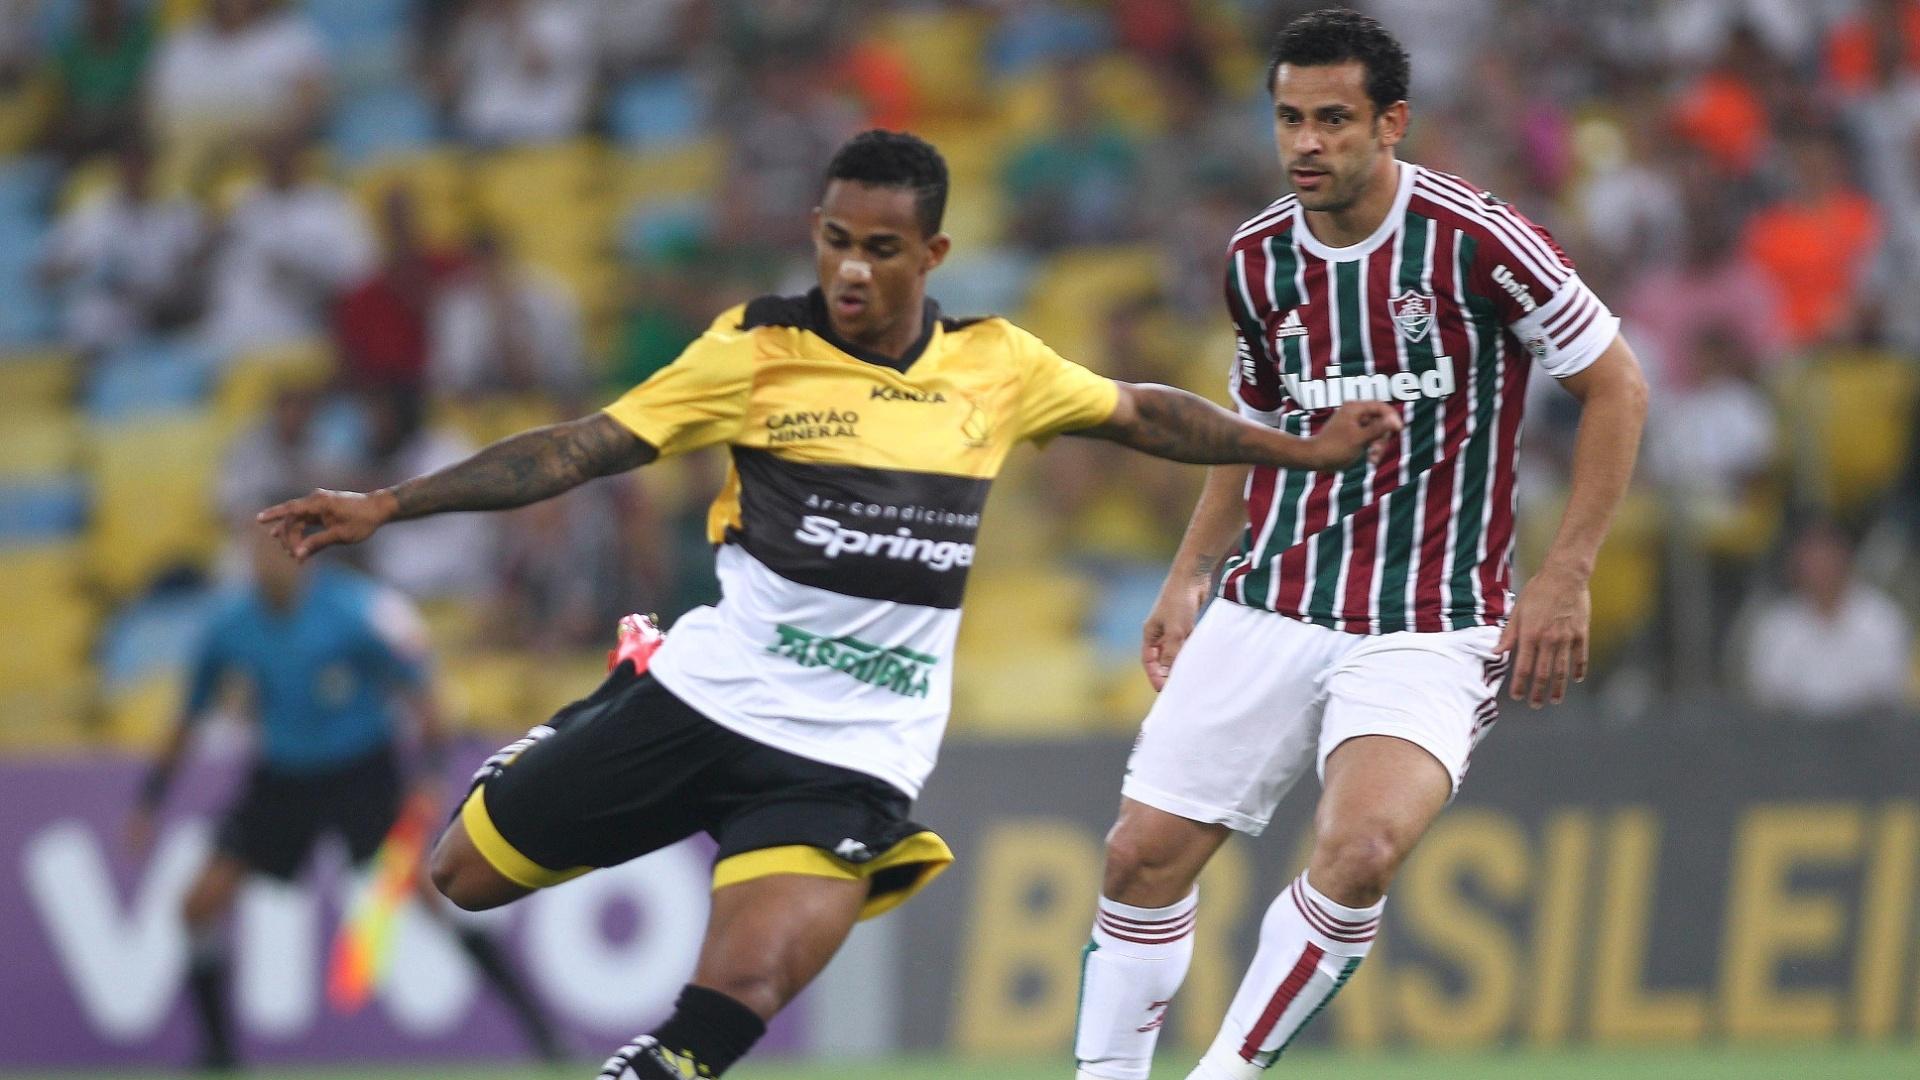 Fluminense e Criciúma se enfrentam no Estádio do Maracanã